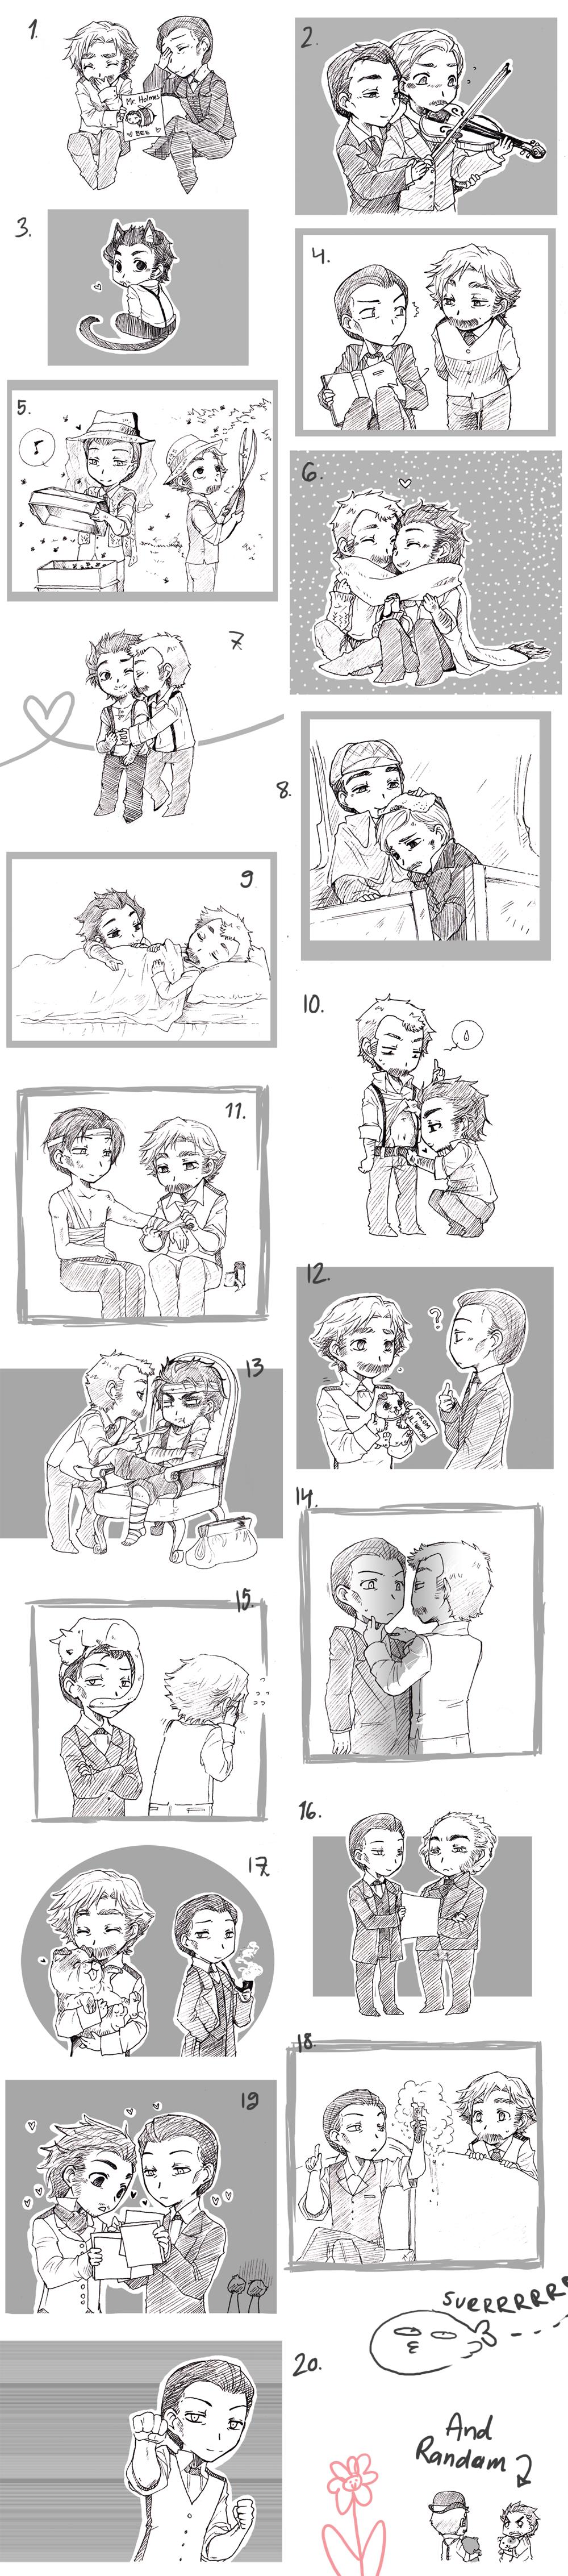 20 Holmes sketch by Sadyna